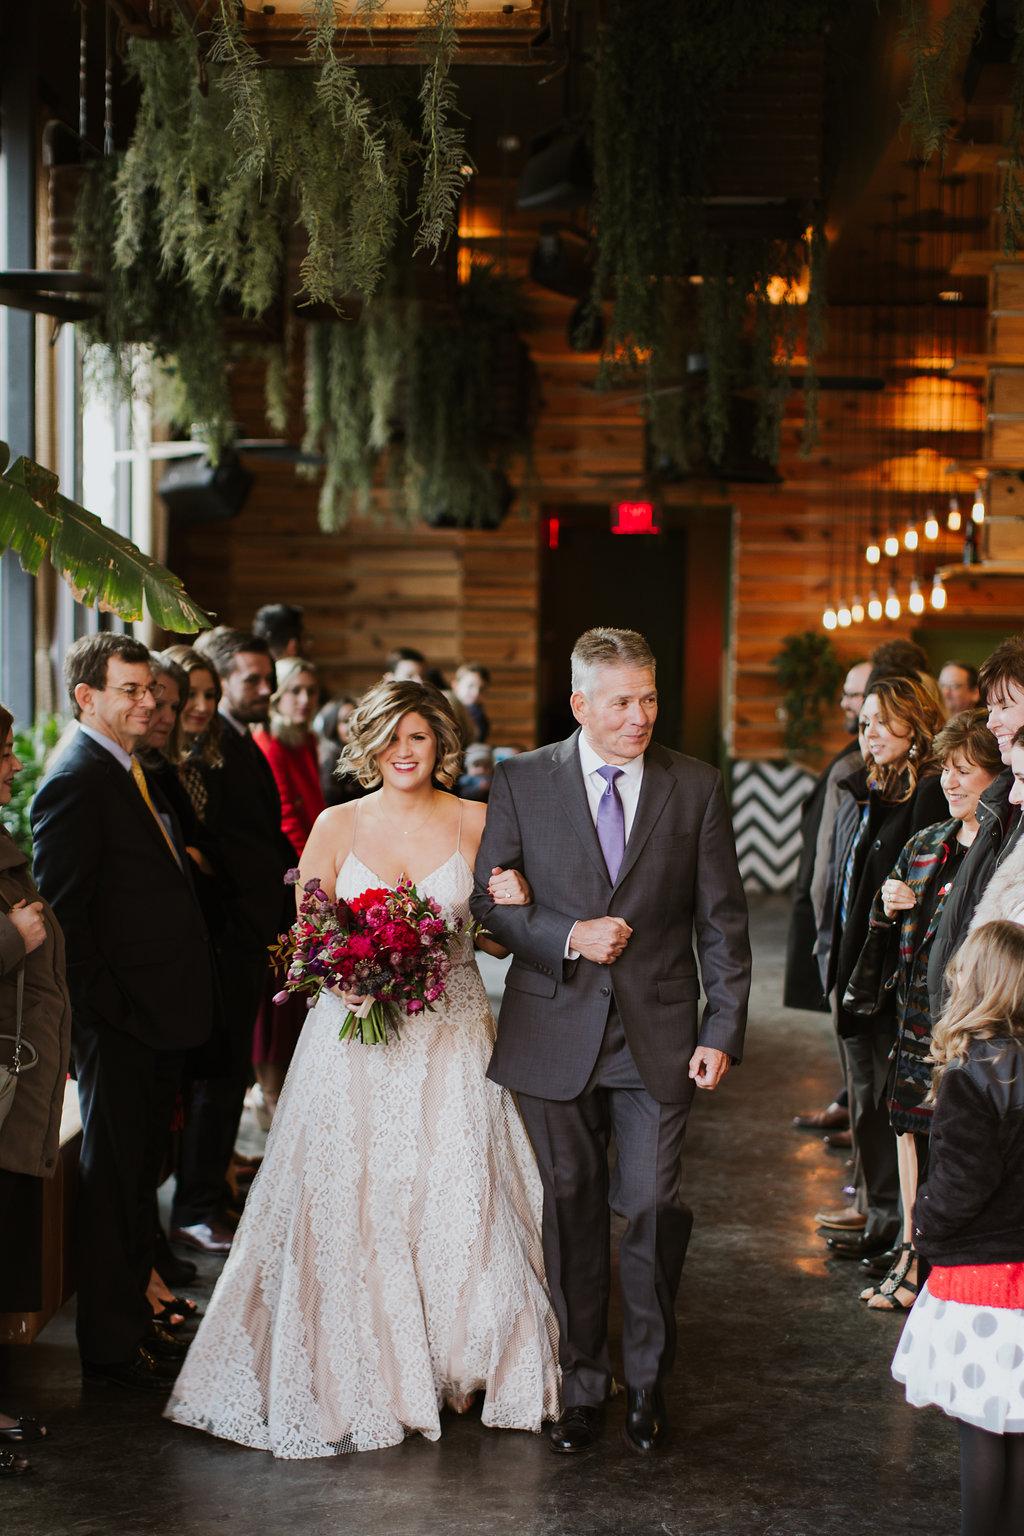 Paige-Newton-Intimate-Wedding-Photographer-Malverde-Wedding-Photography0047.jpg